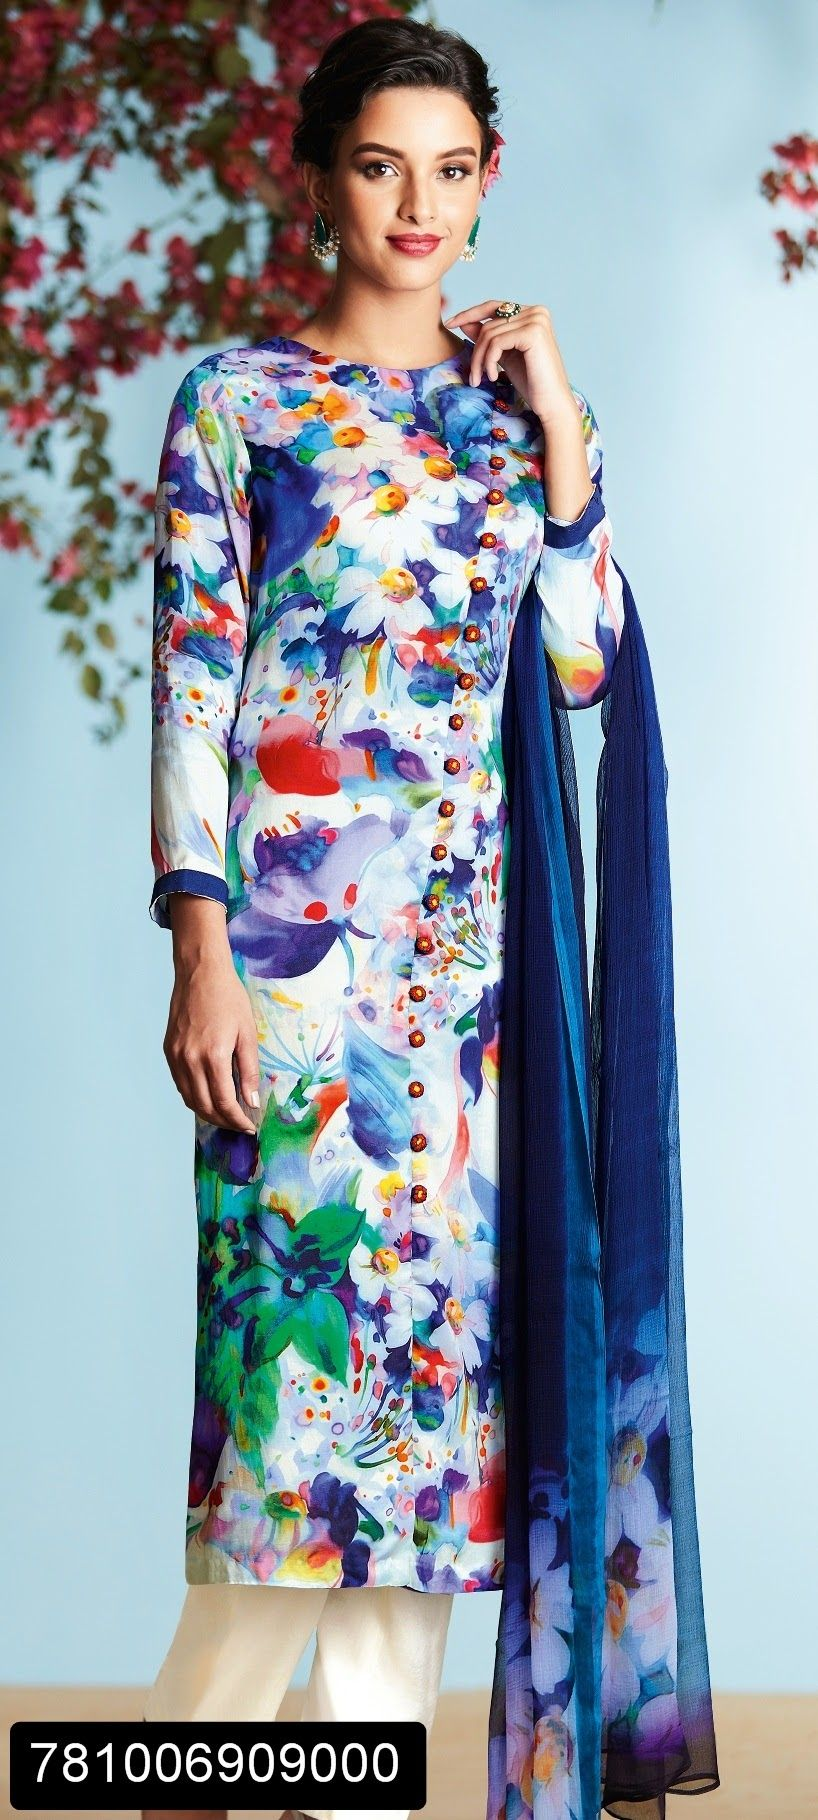 6b434c12d9 Latest pant style digital print suit for working women with chiffon digital  print dupatta